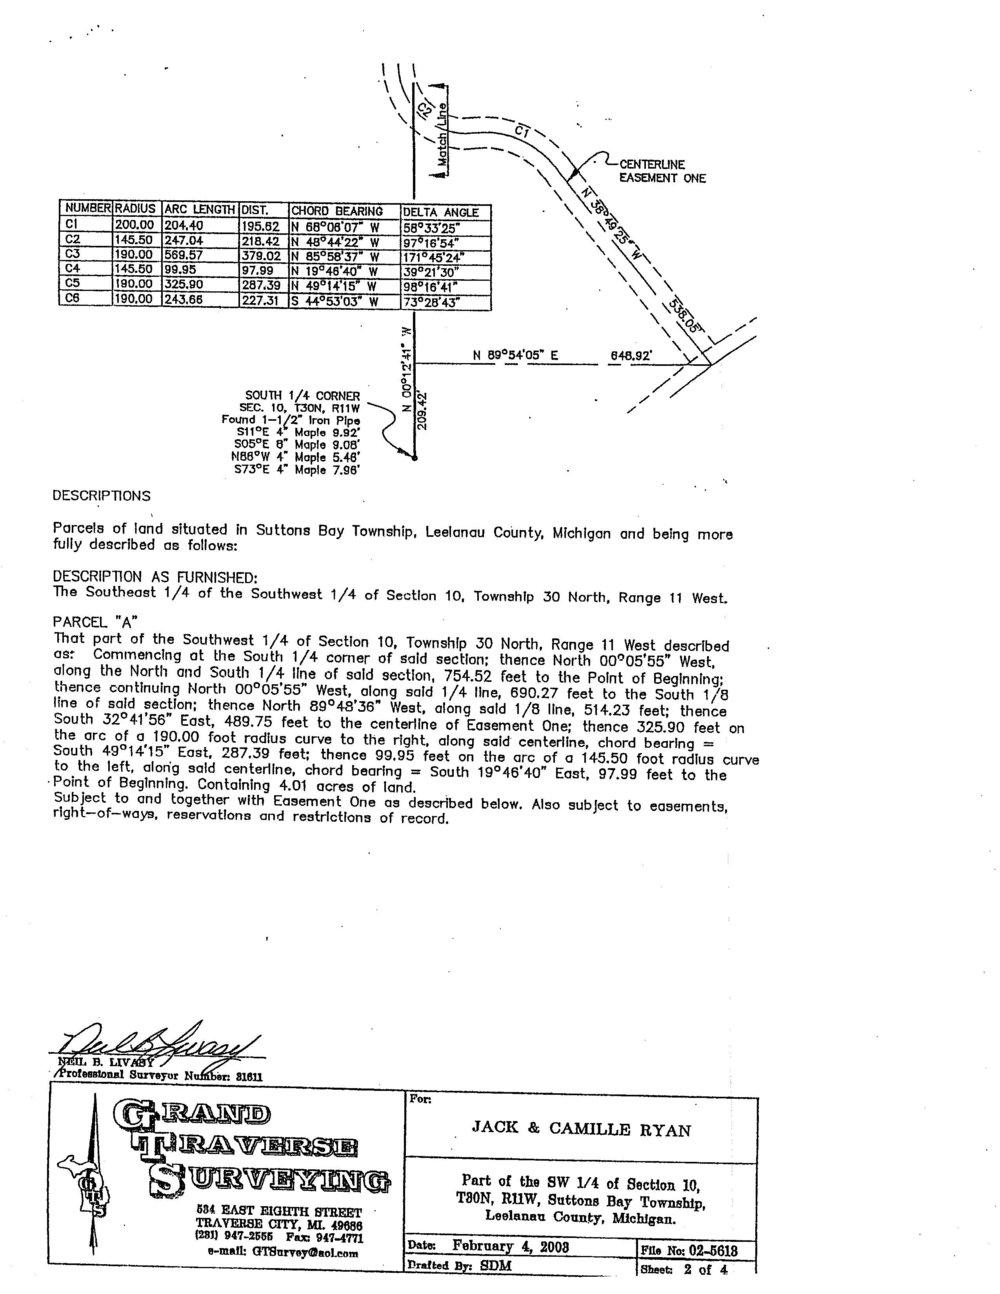 11635 E Belanger Woods Dr Marketing Packet - For Sale by Oltersdorf Realty LLC (12).jpg